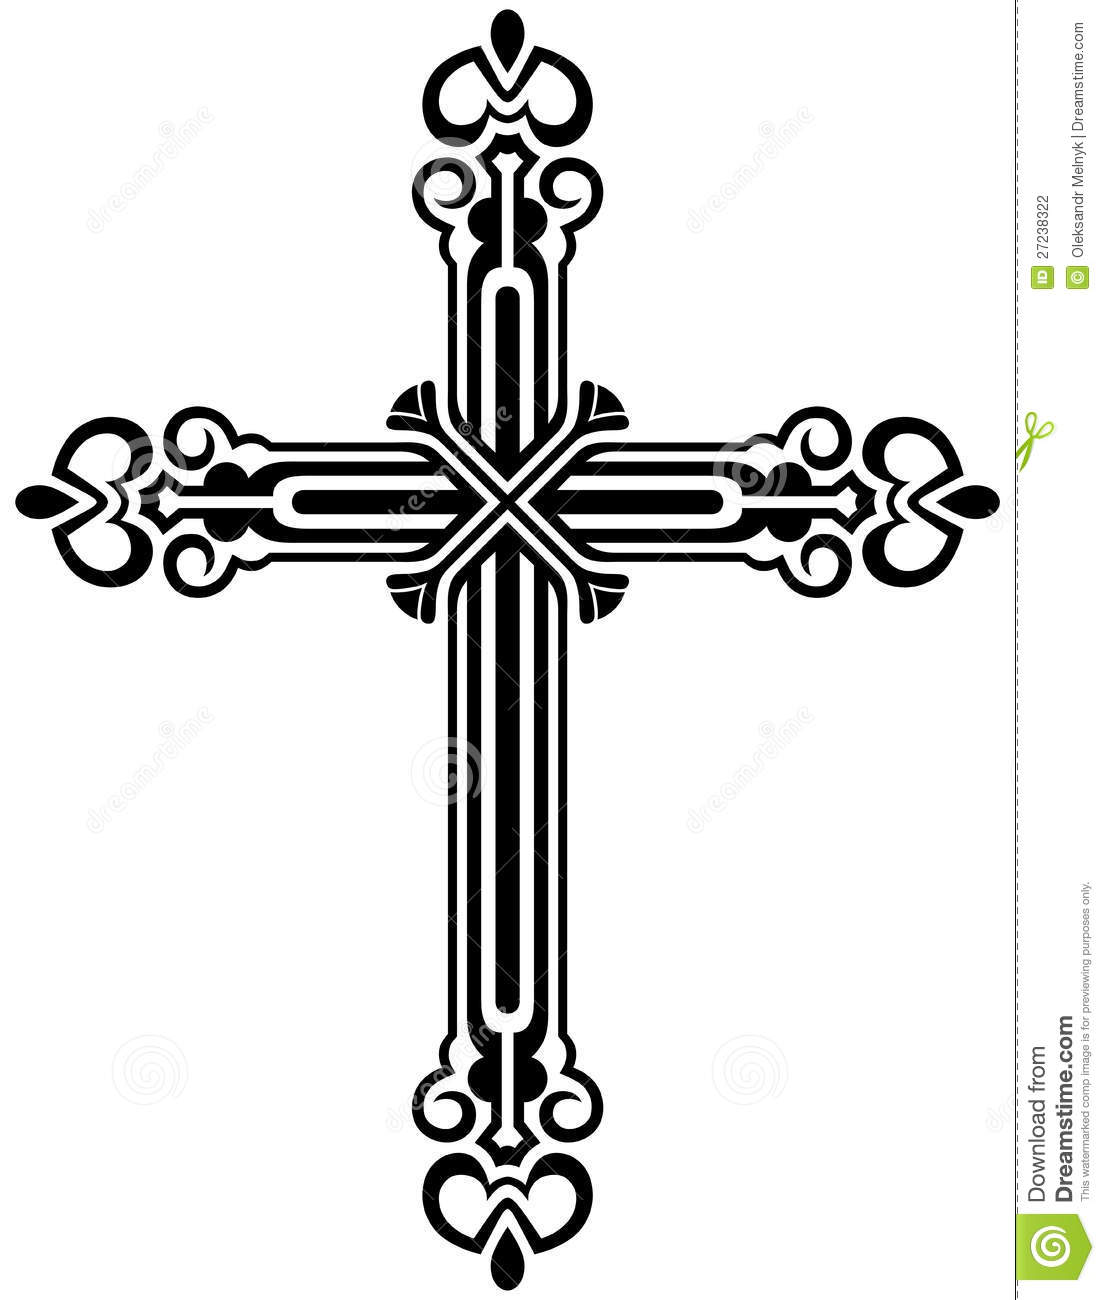 1105x1300 Catholic Cross Clipart Help Desk Kpi